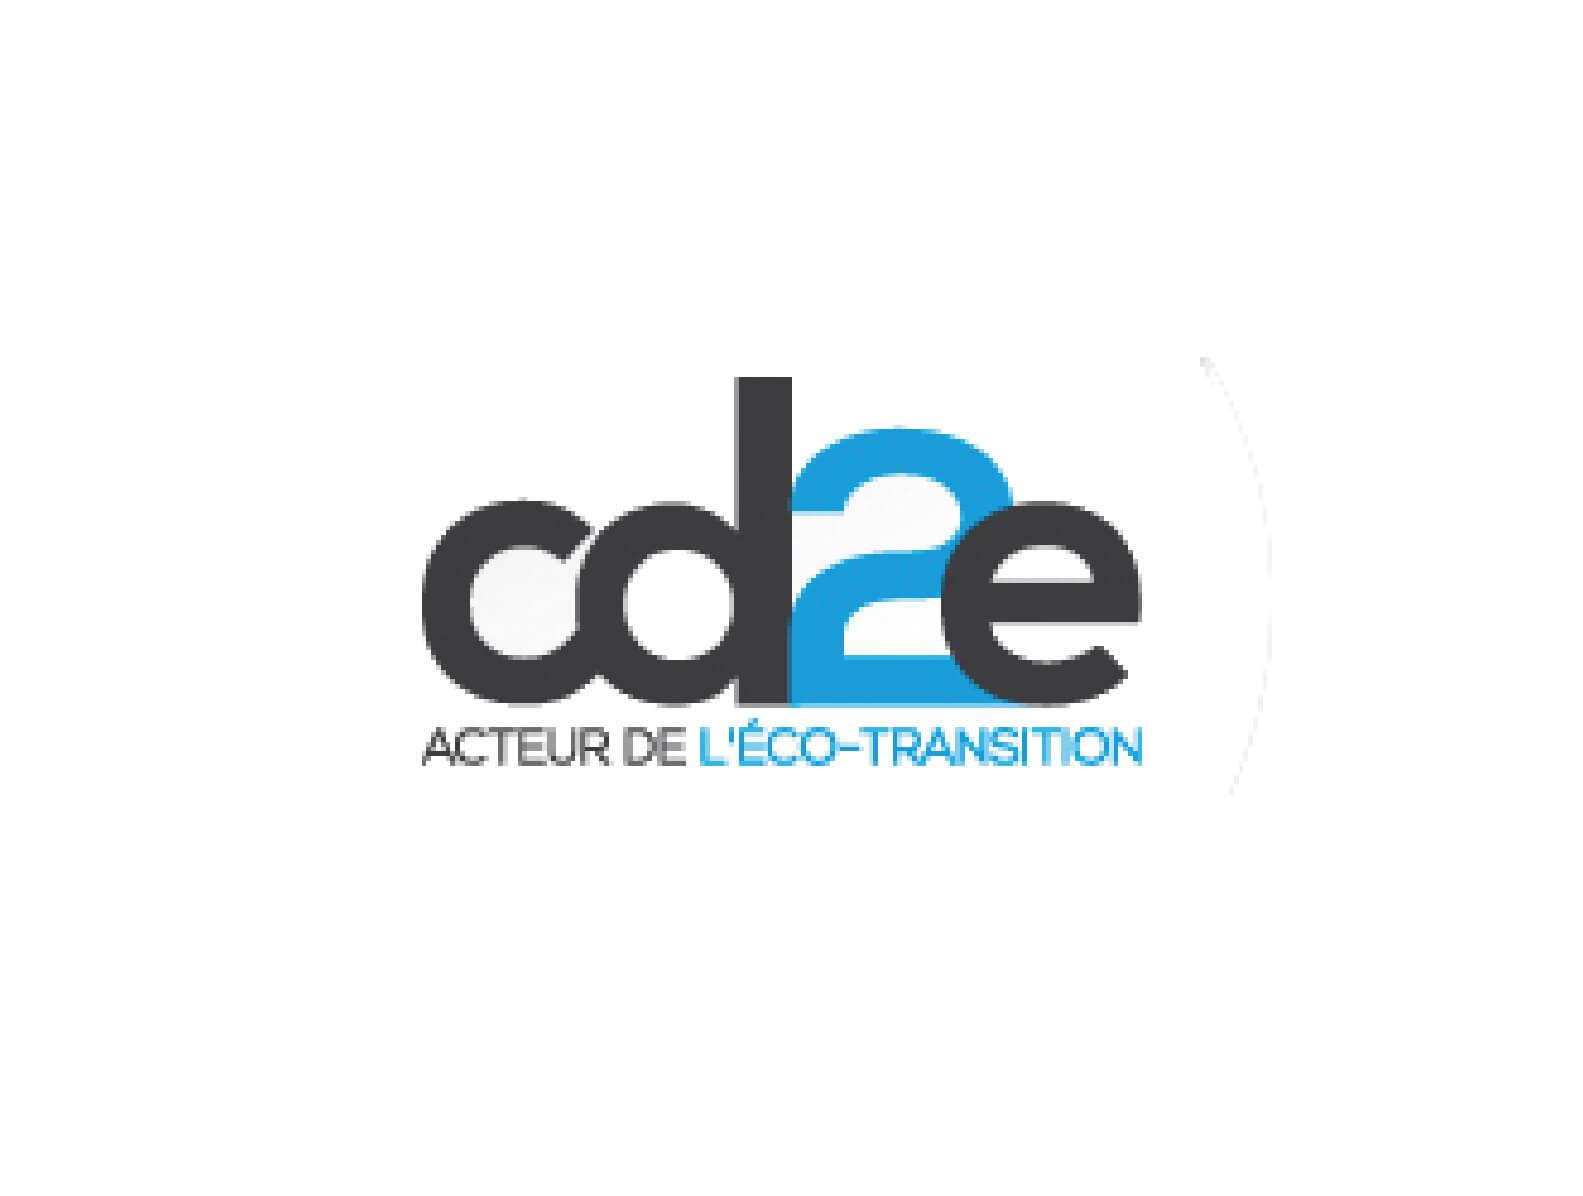 agence kayak communication web lille nord logo éco-transition